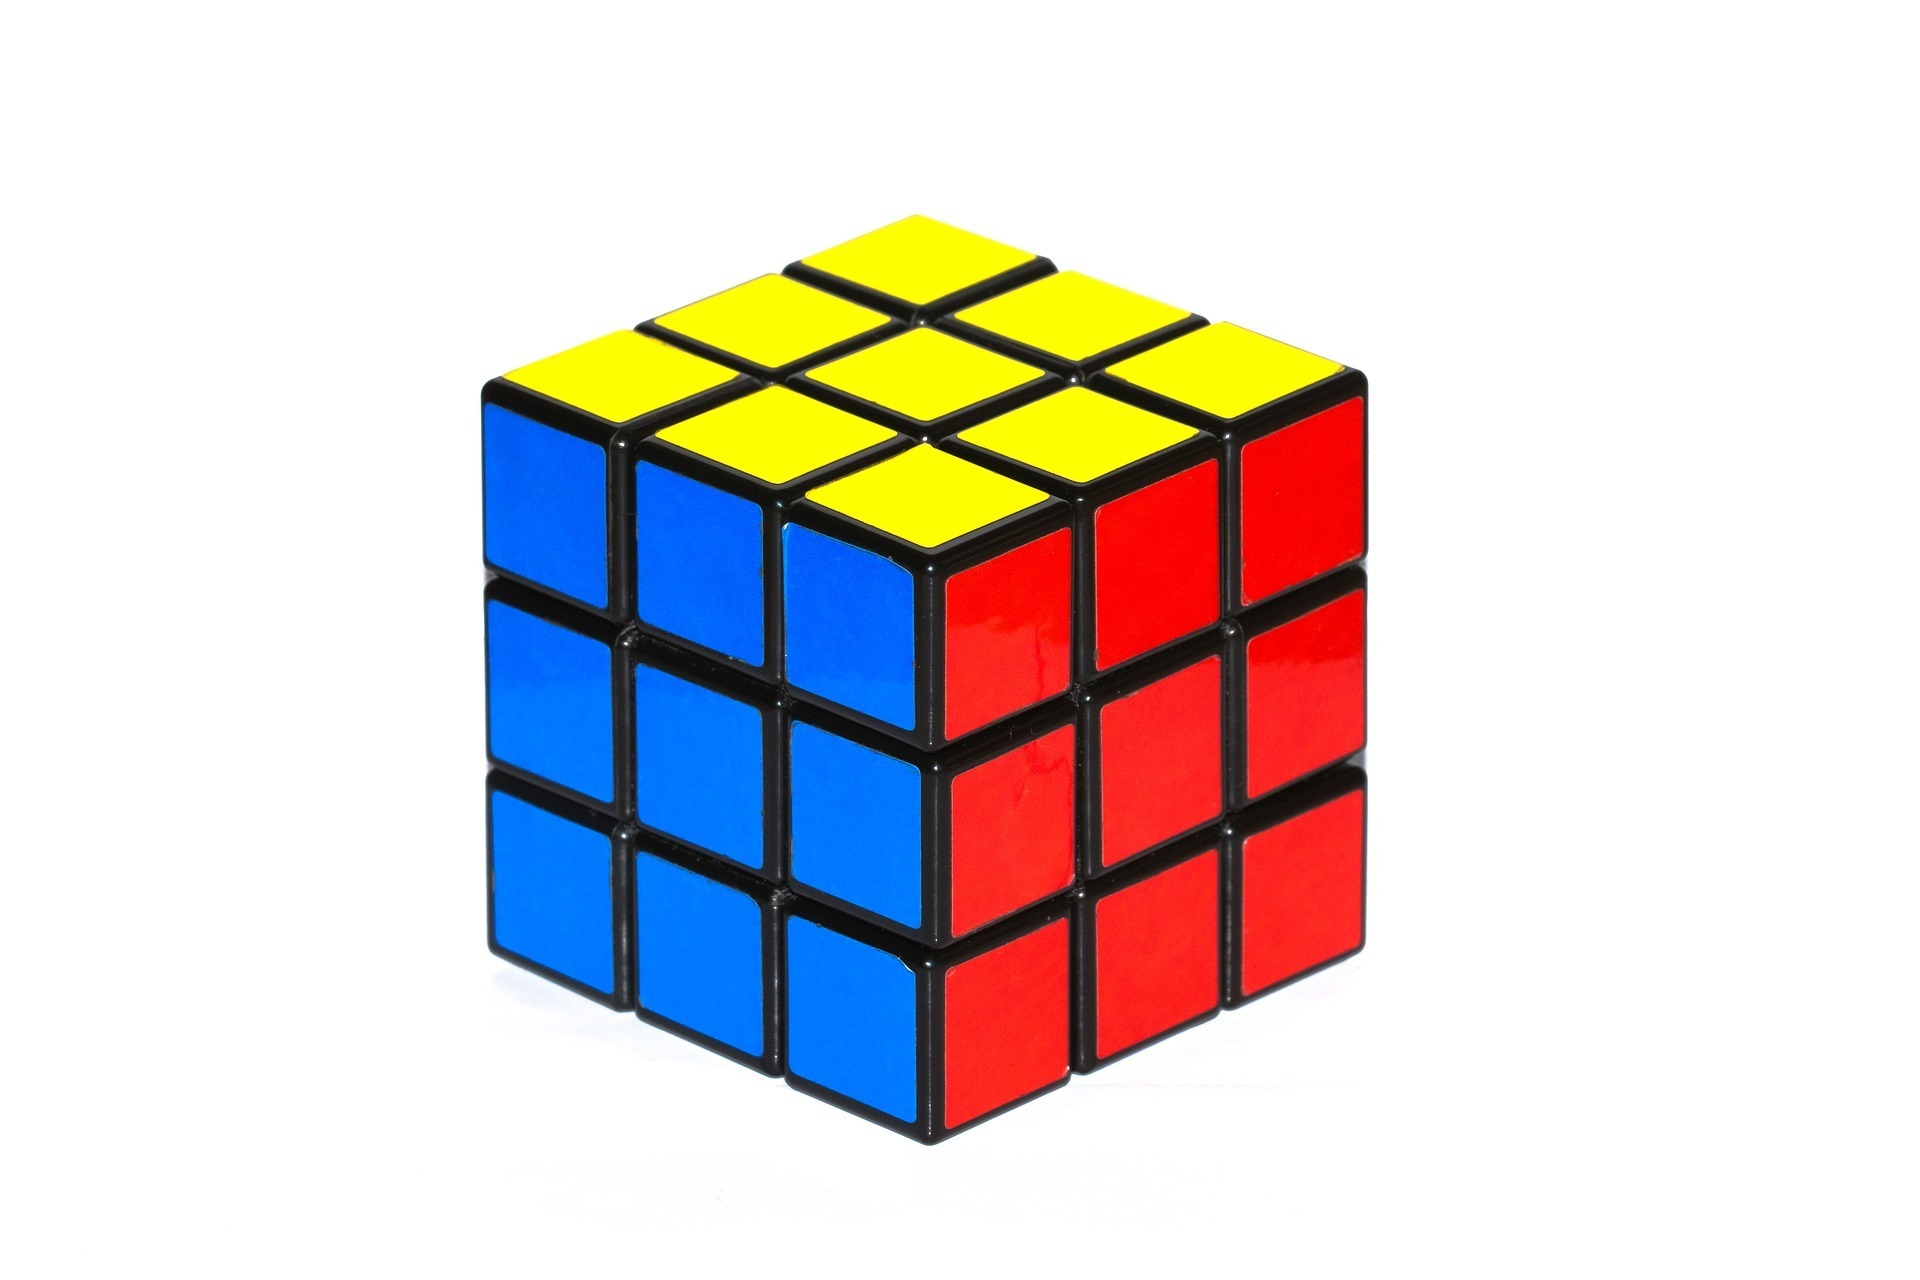 cube-1800843_1920.jpg